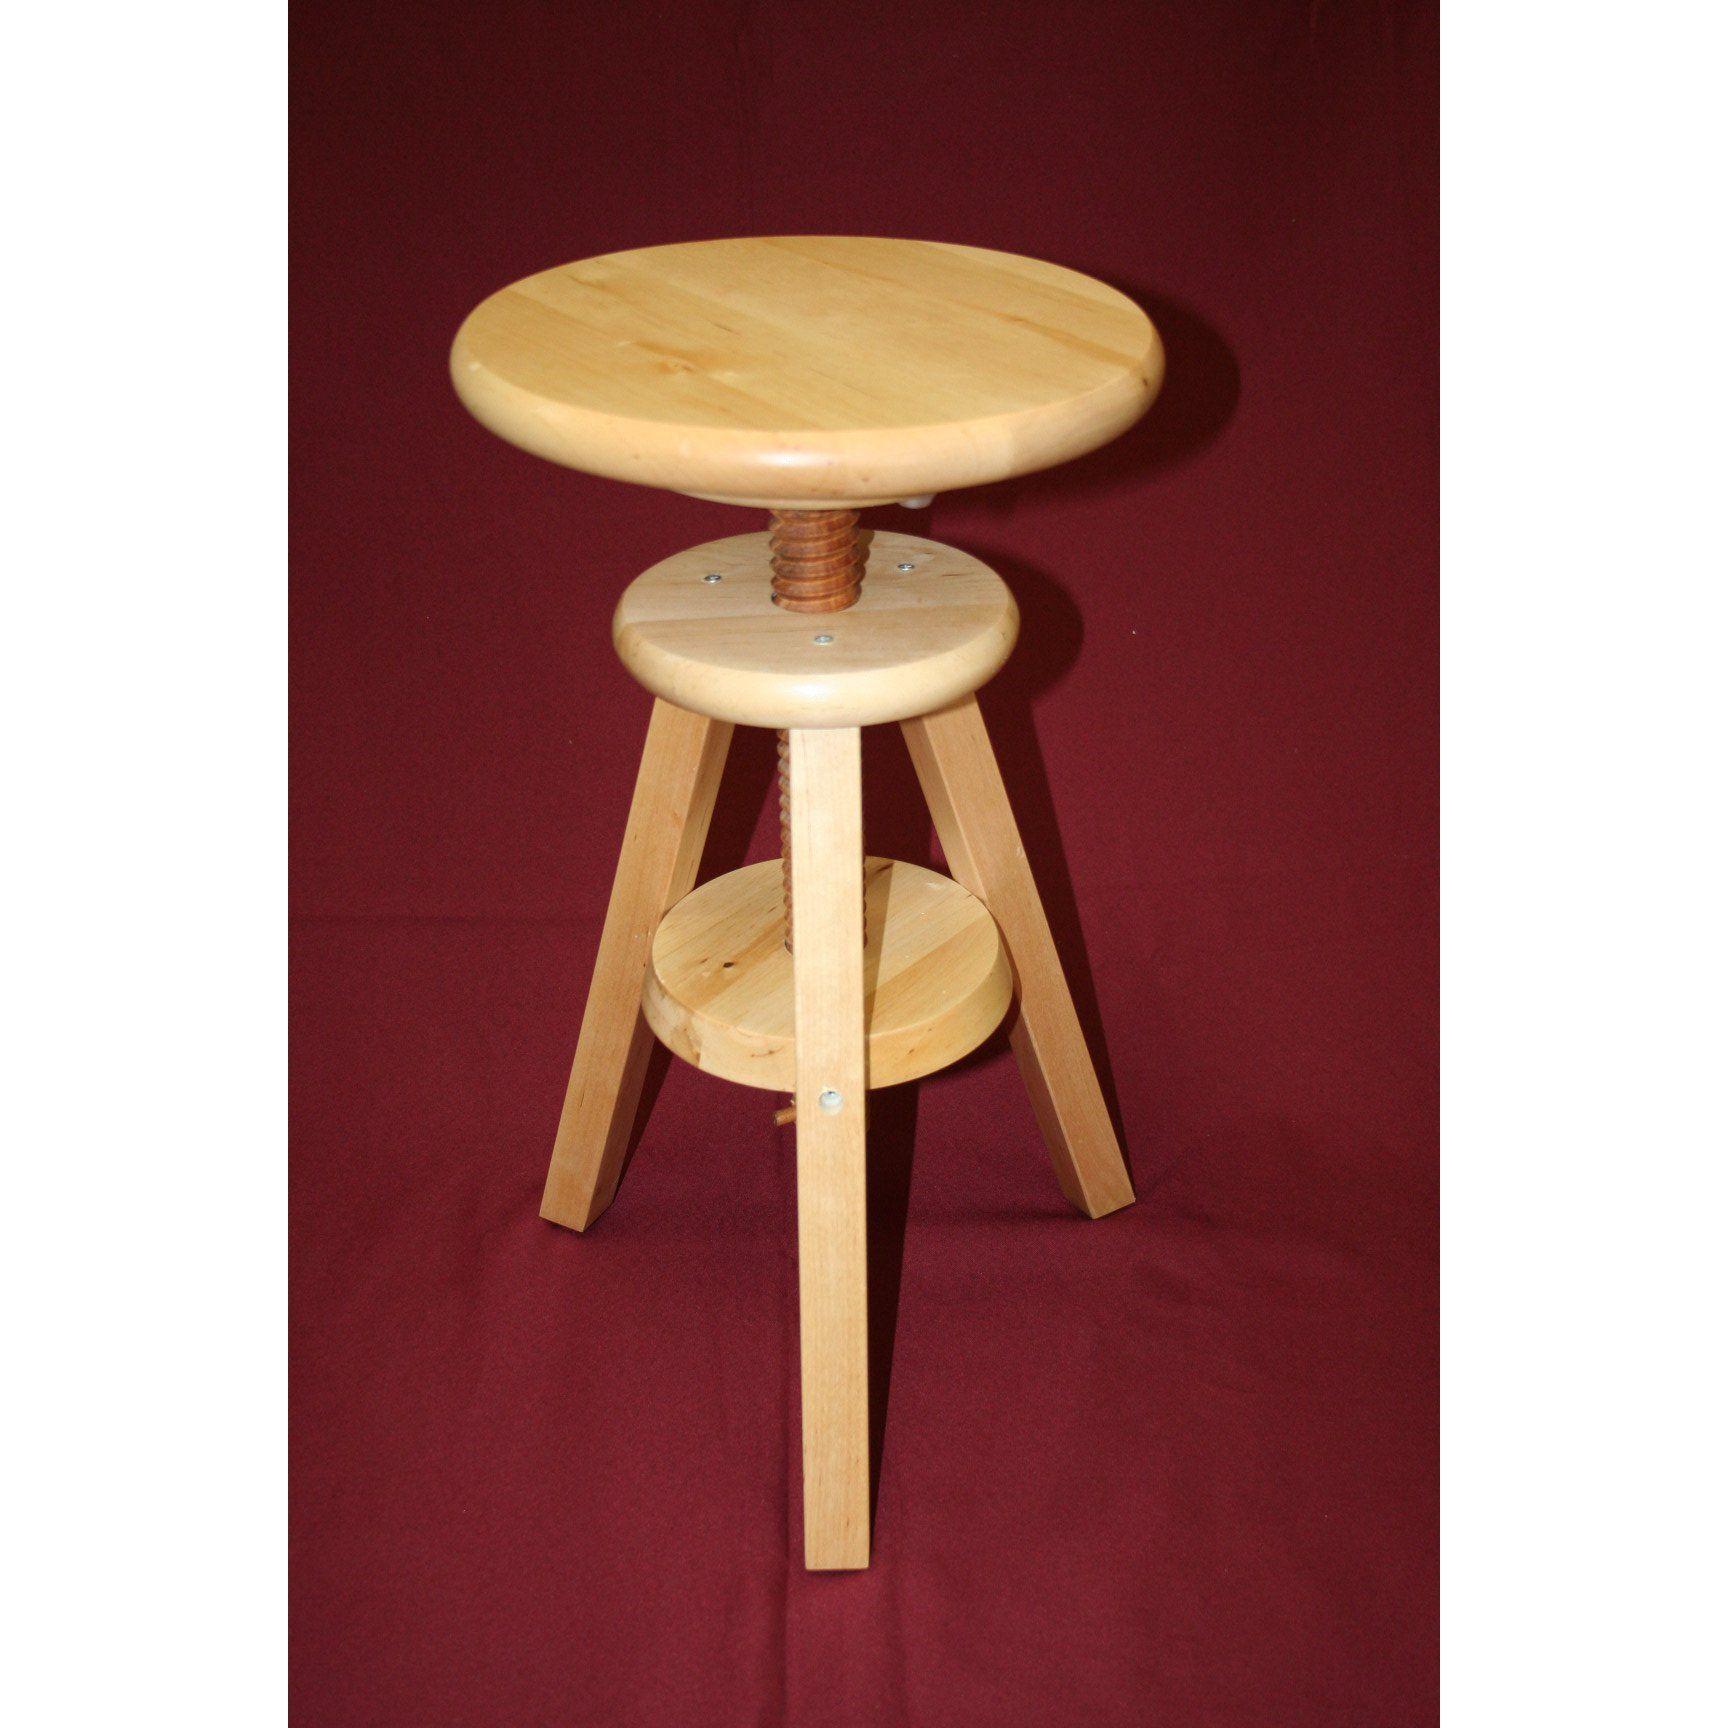 Wayfair 50 Wooden Adjustable Height Swivel Bar Stool